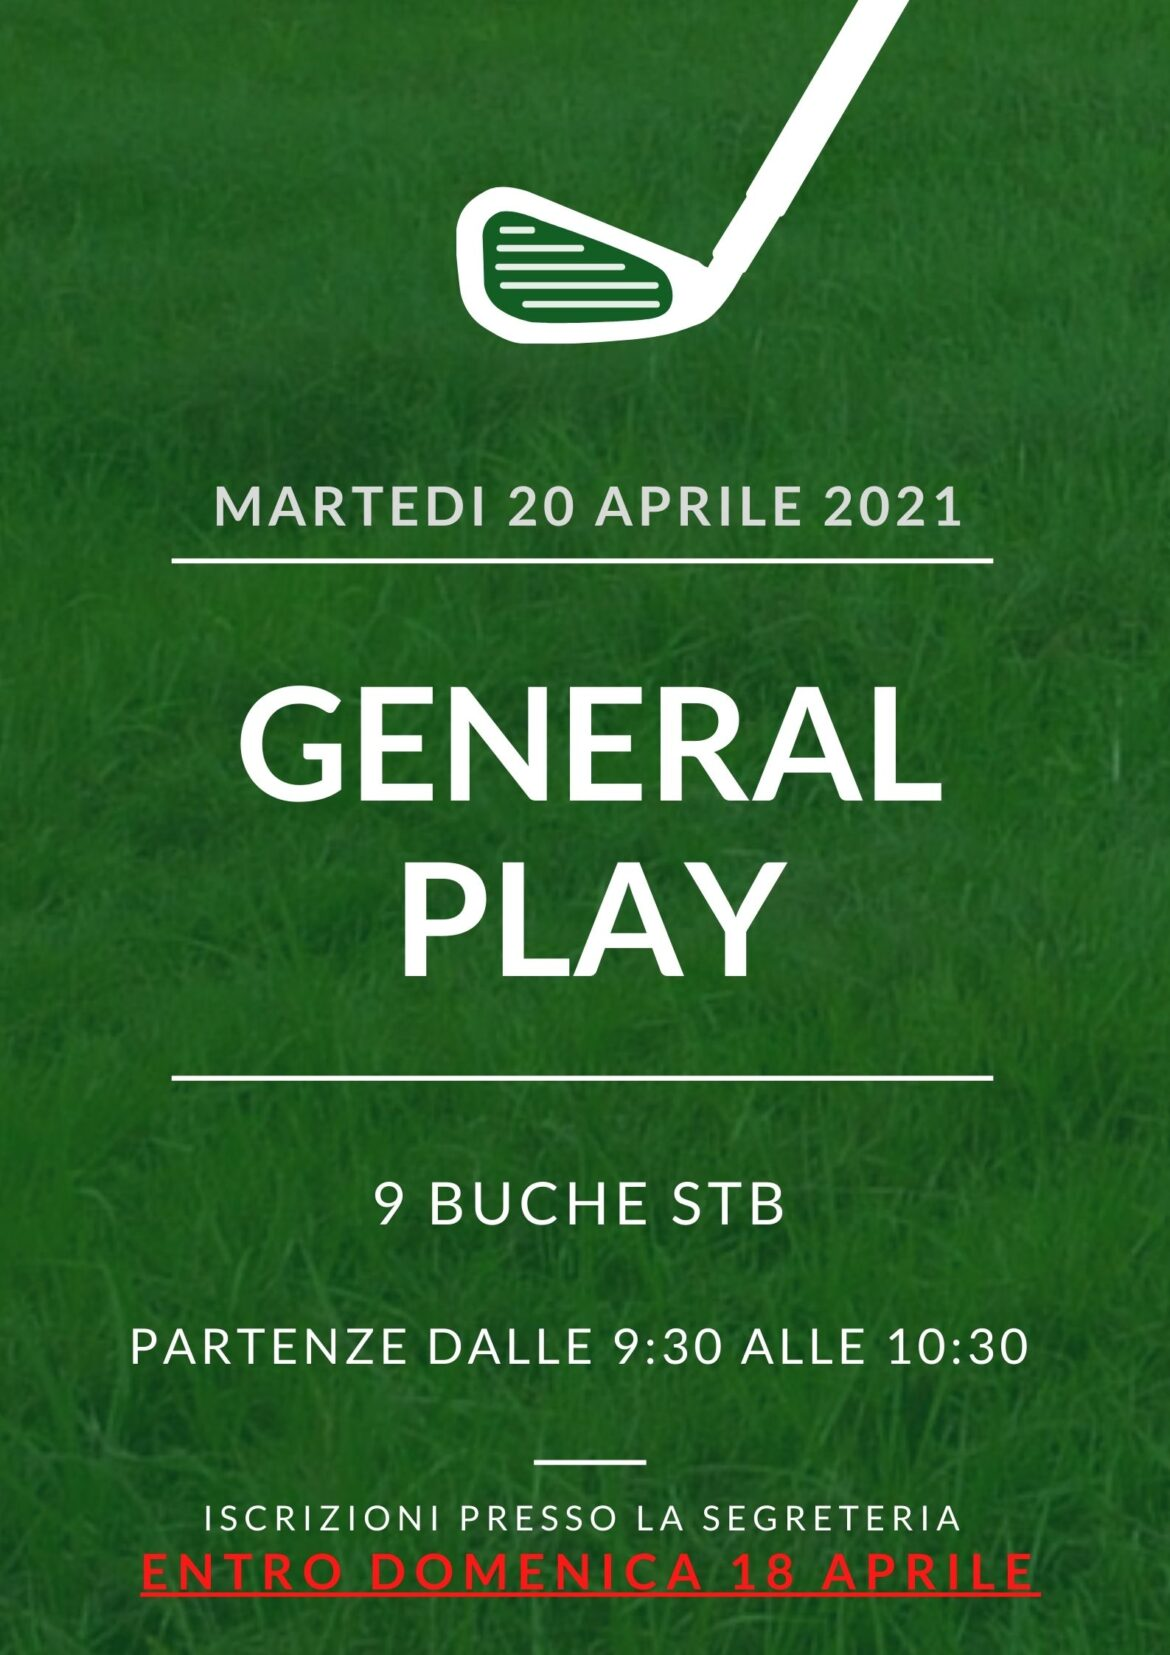 GENERAL PLAY 20 APRILE 2021-ANNULLATO